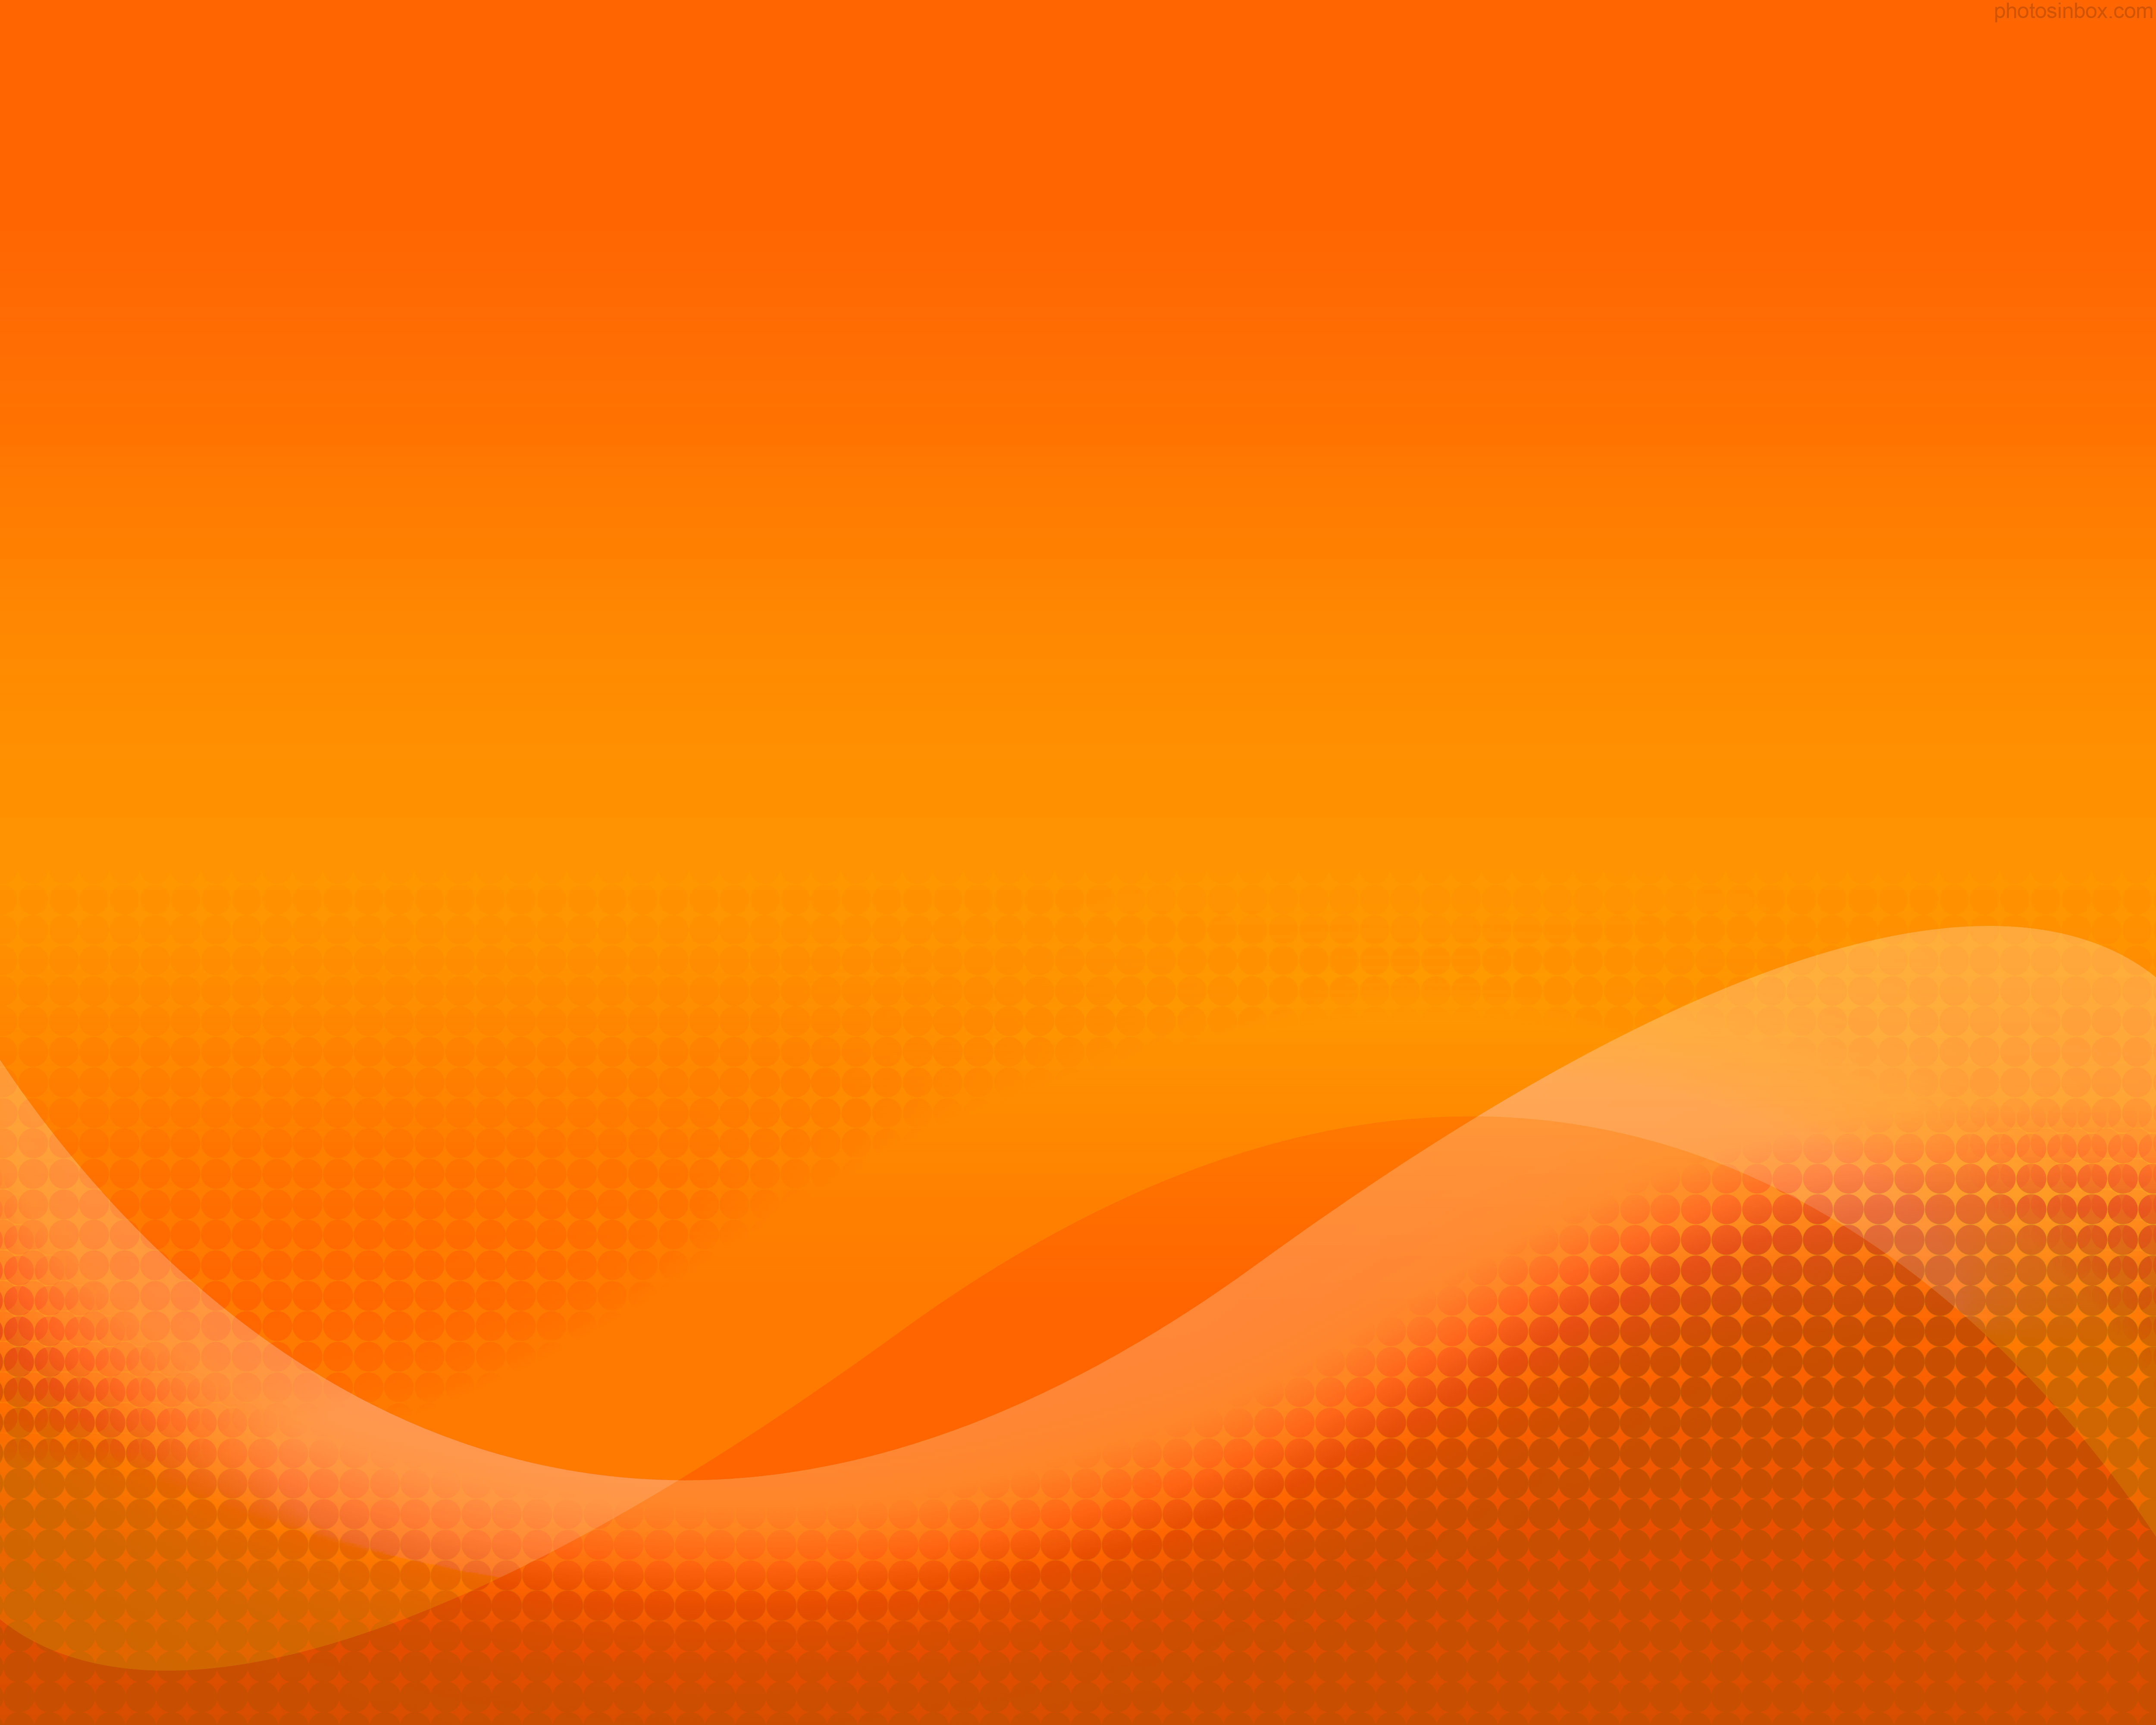 Abstract orange halftone background PhotosInBox 5000x4000